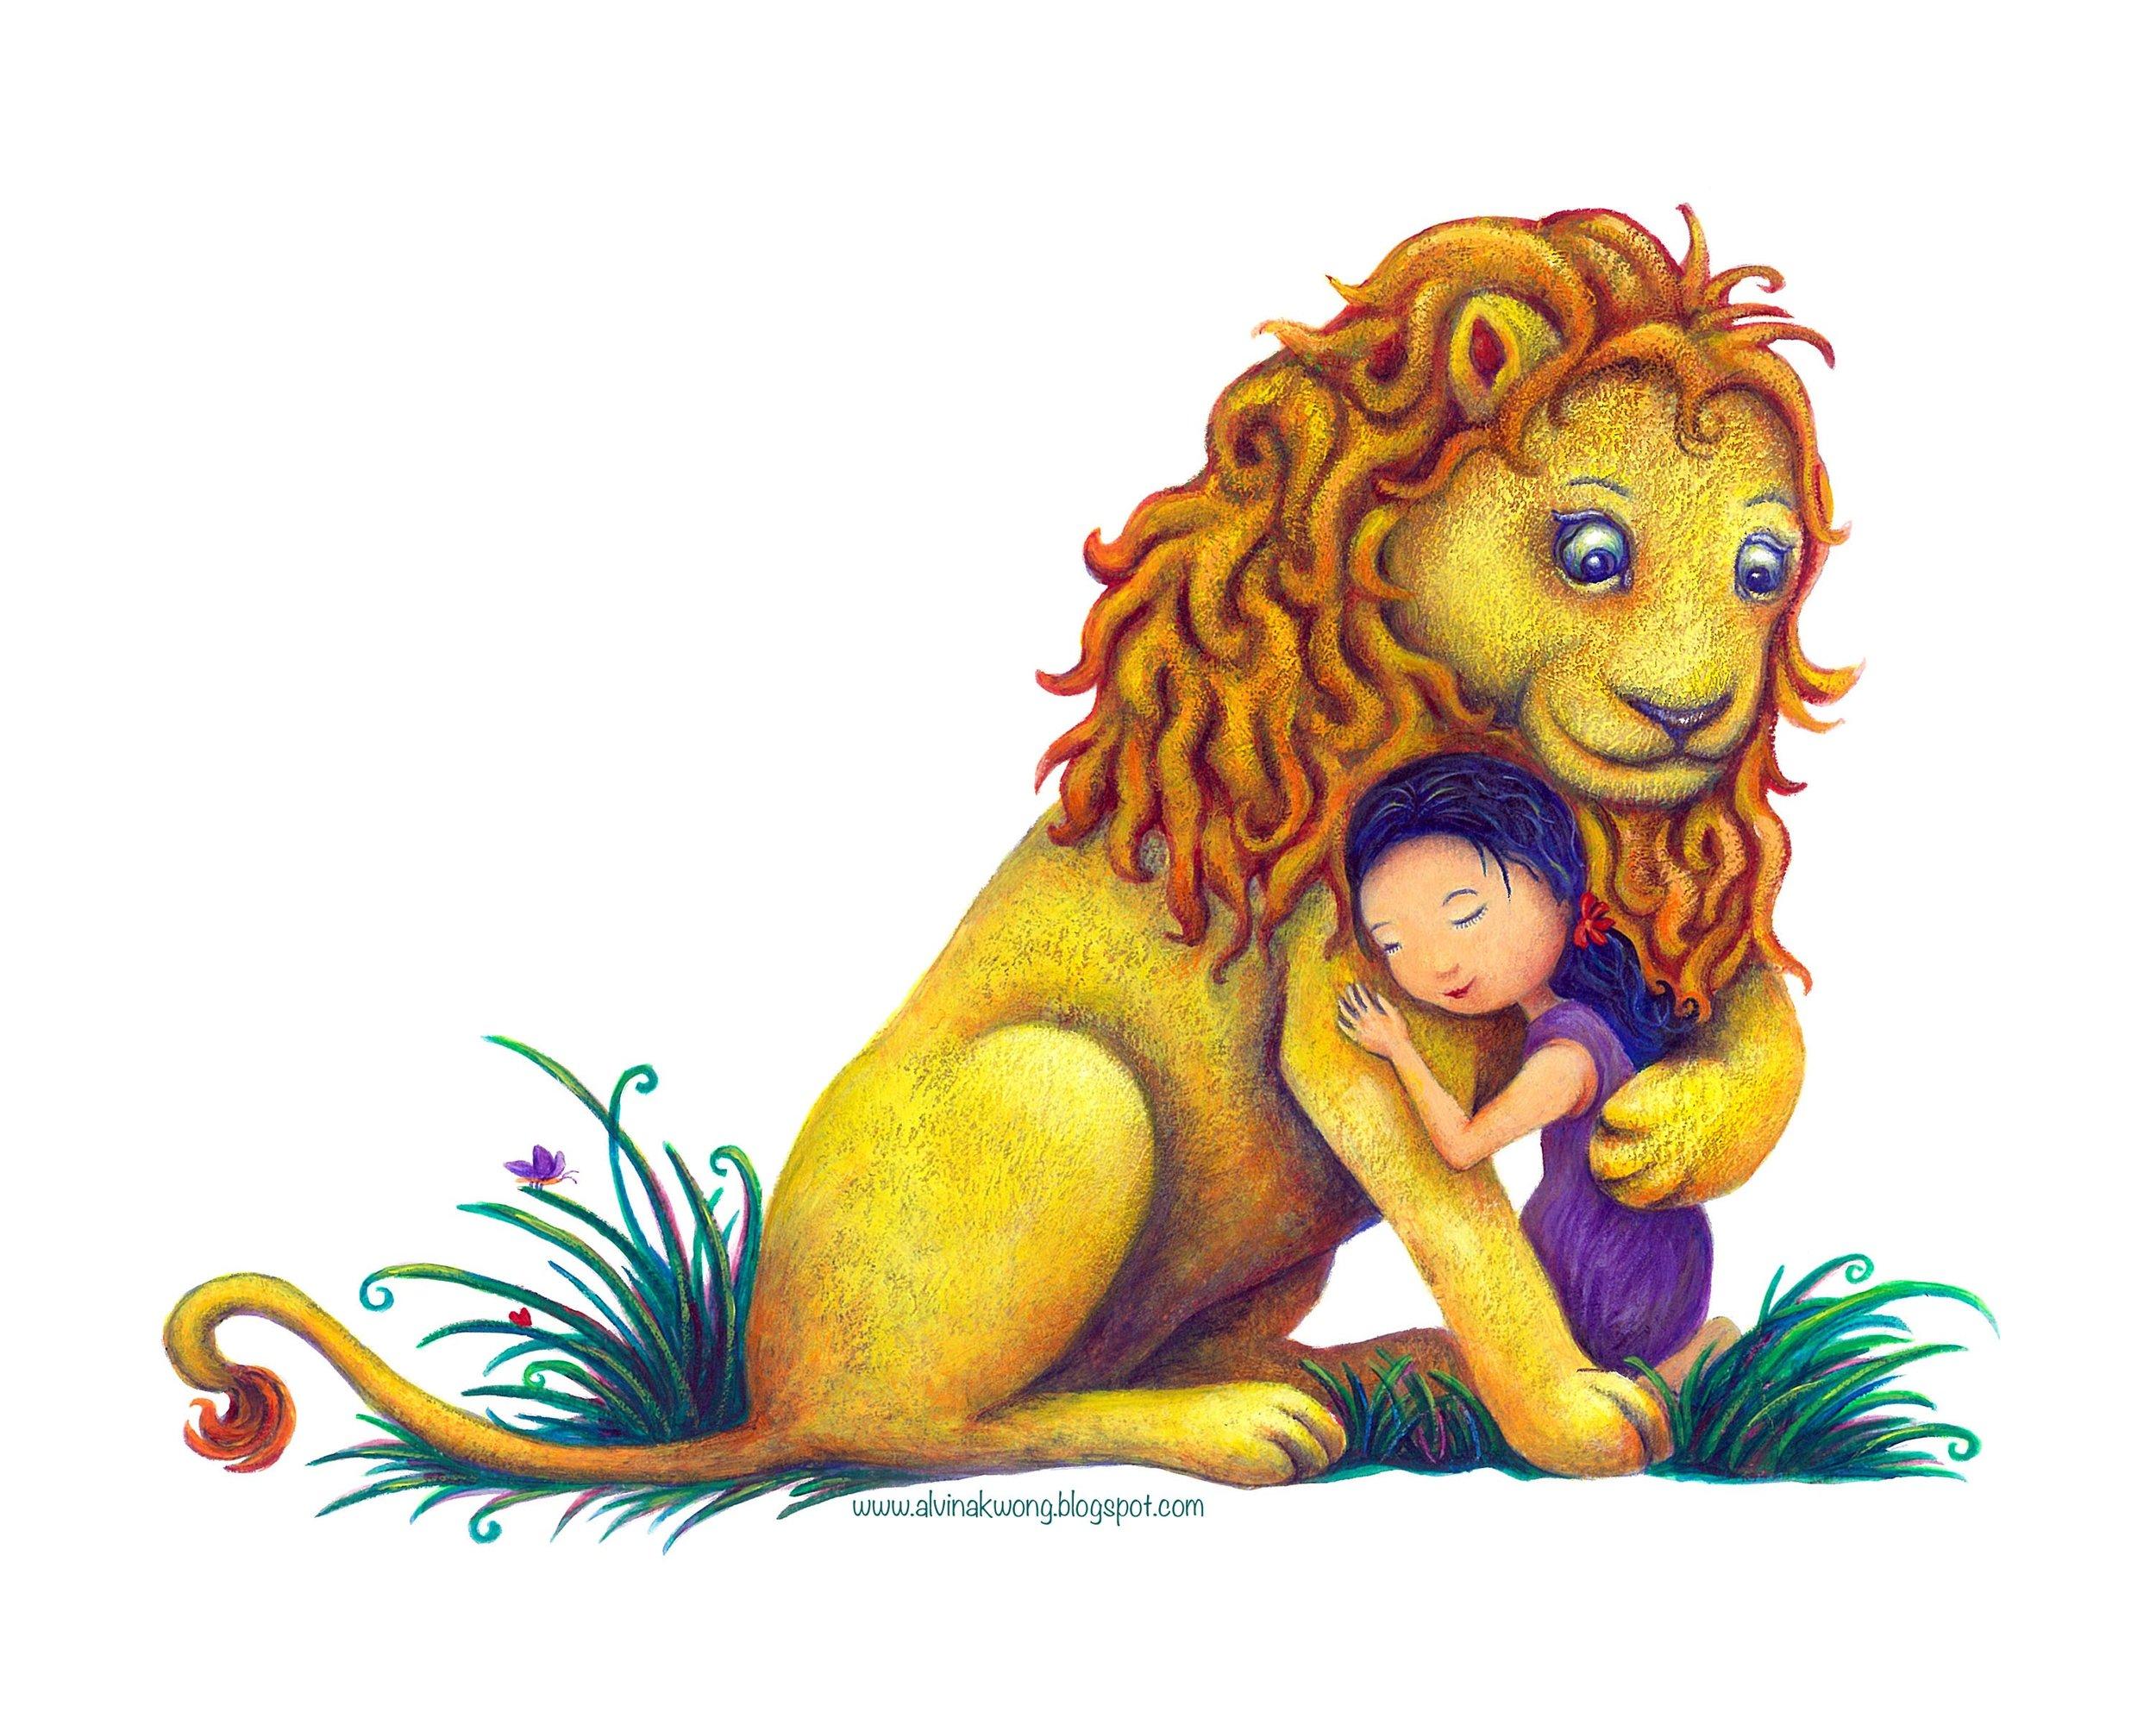 Sweet Lion 300dpi watermark.jpg